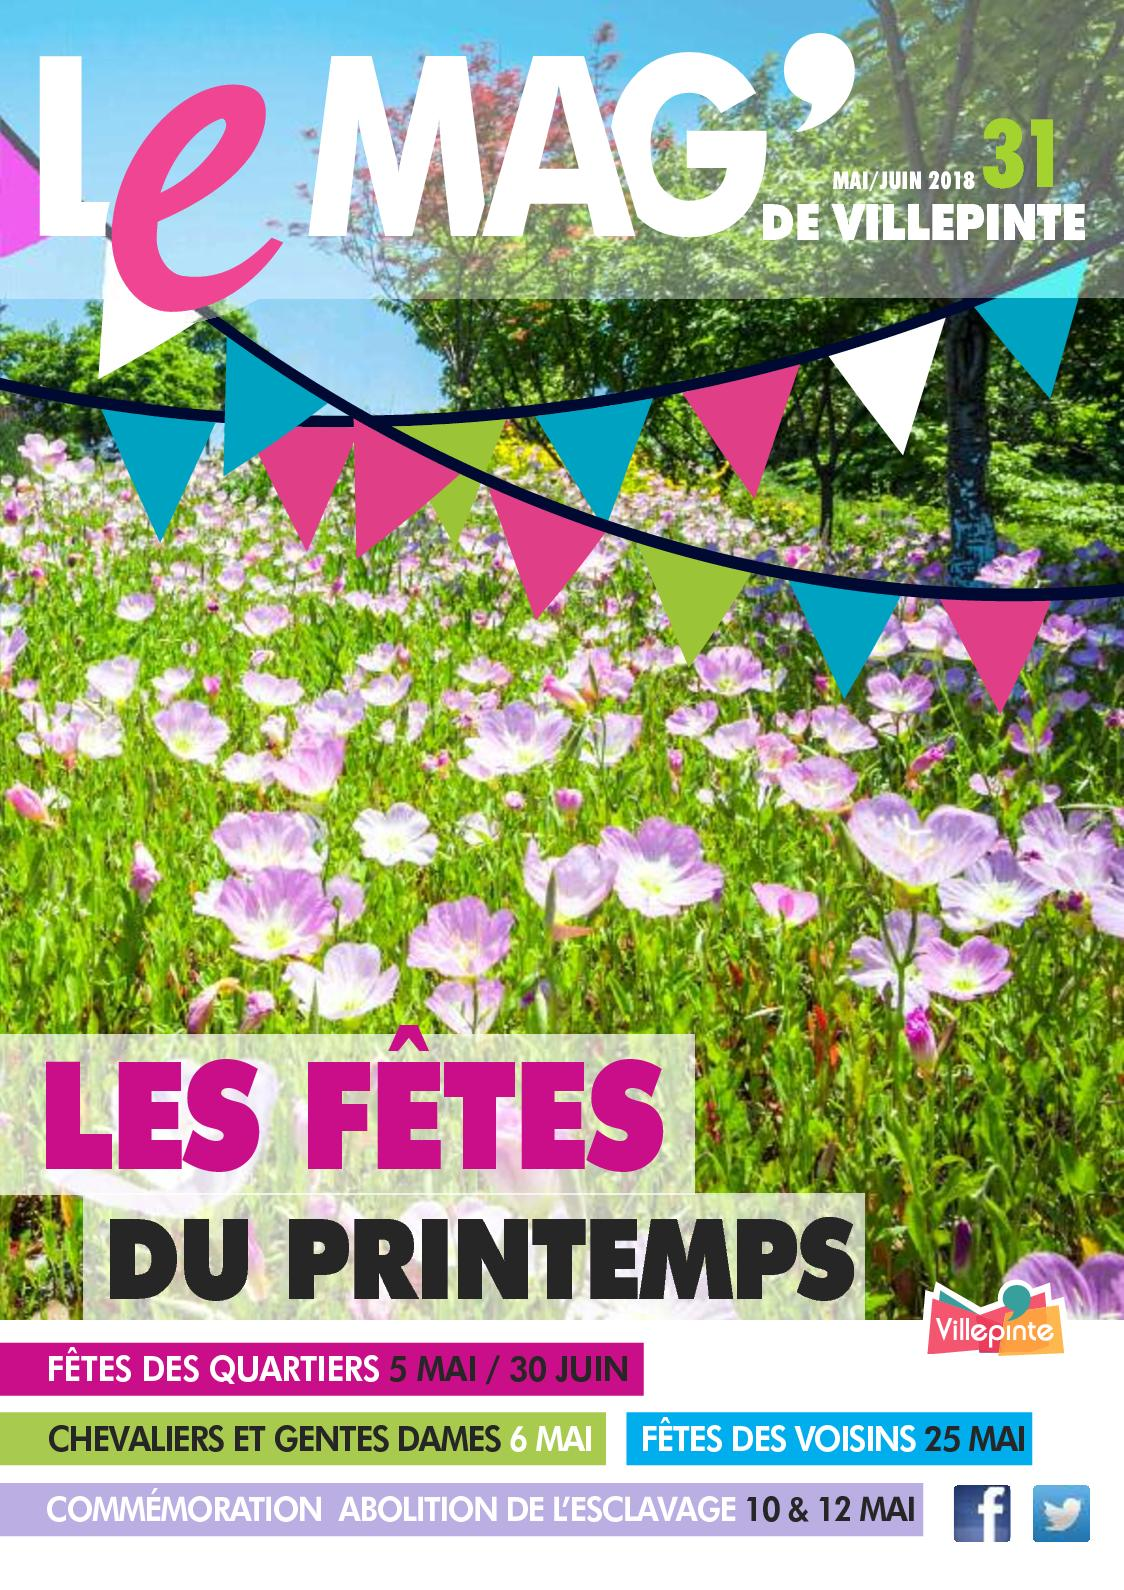 Calaméo - Villepinte Le Mag 31 6945d7eb56c5